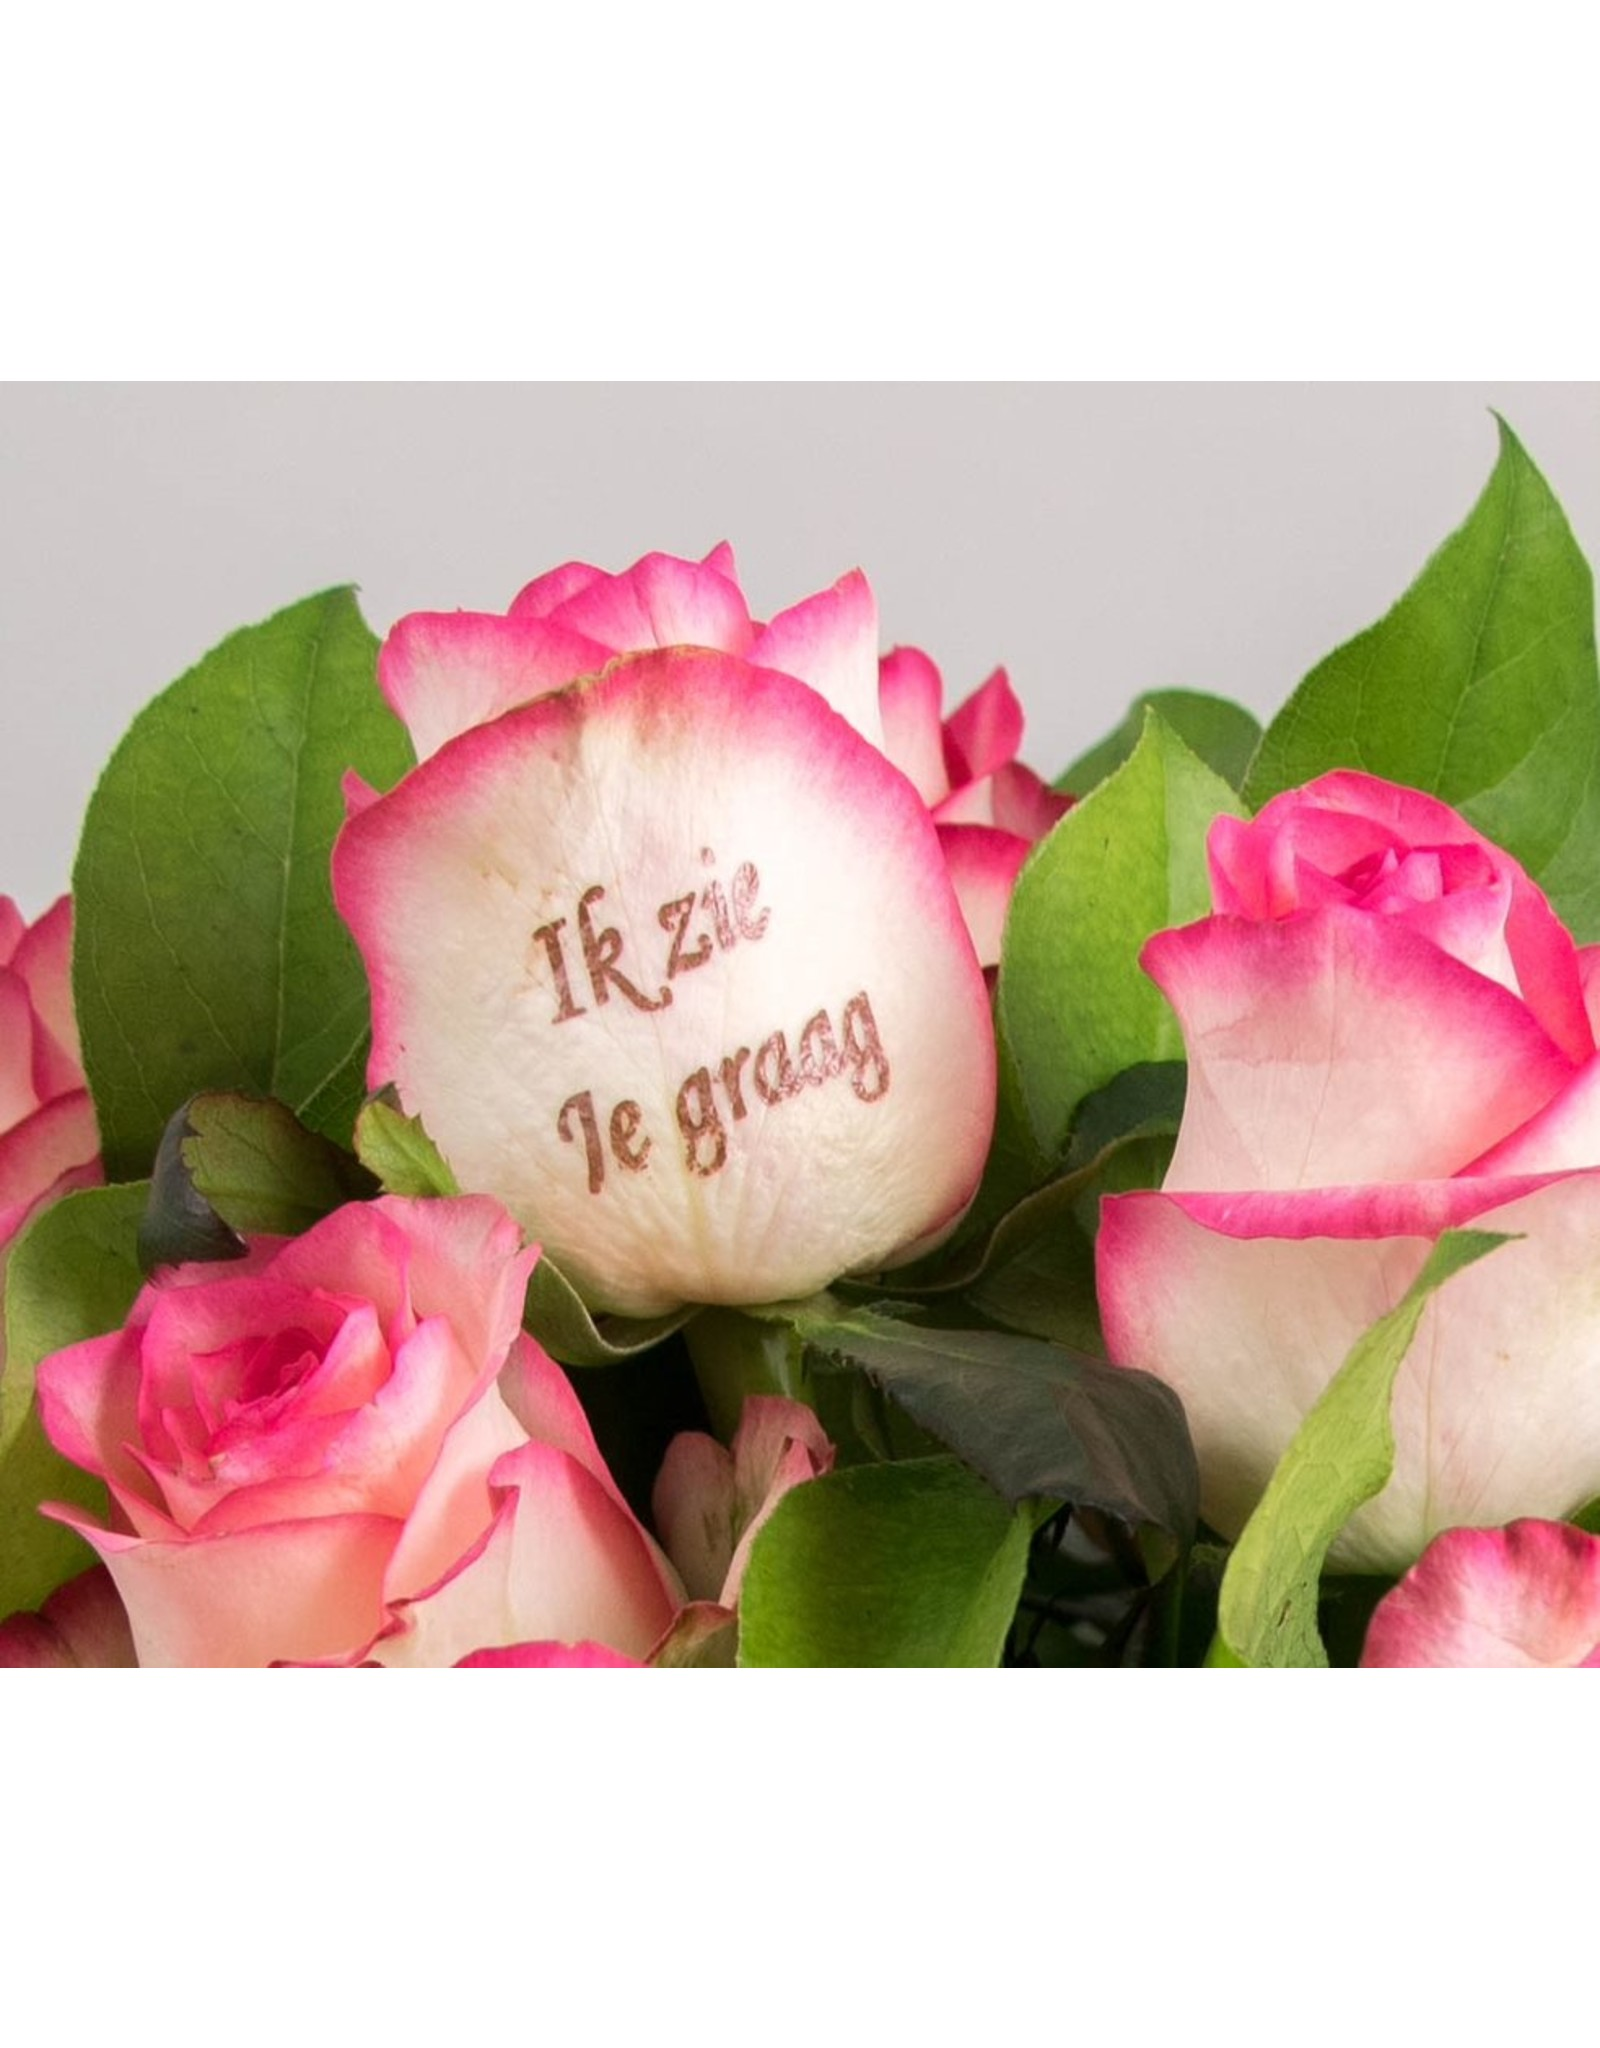 Magic Flowers Boeket 9 rozen - Wit/roze - Zie je graag